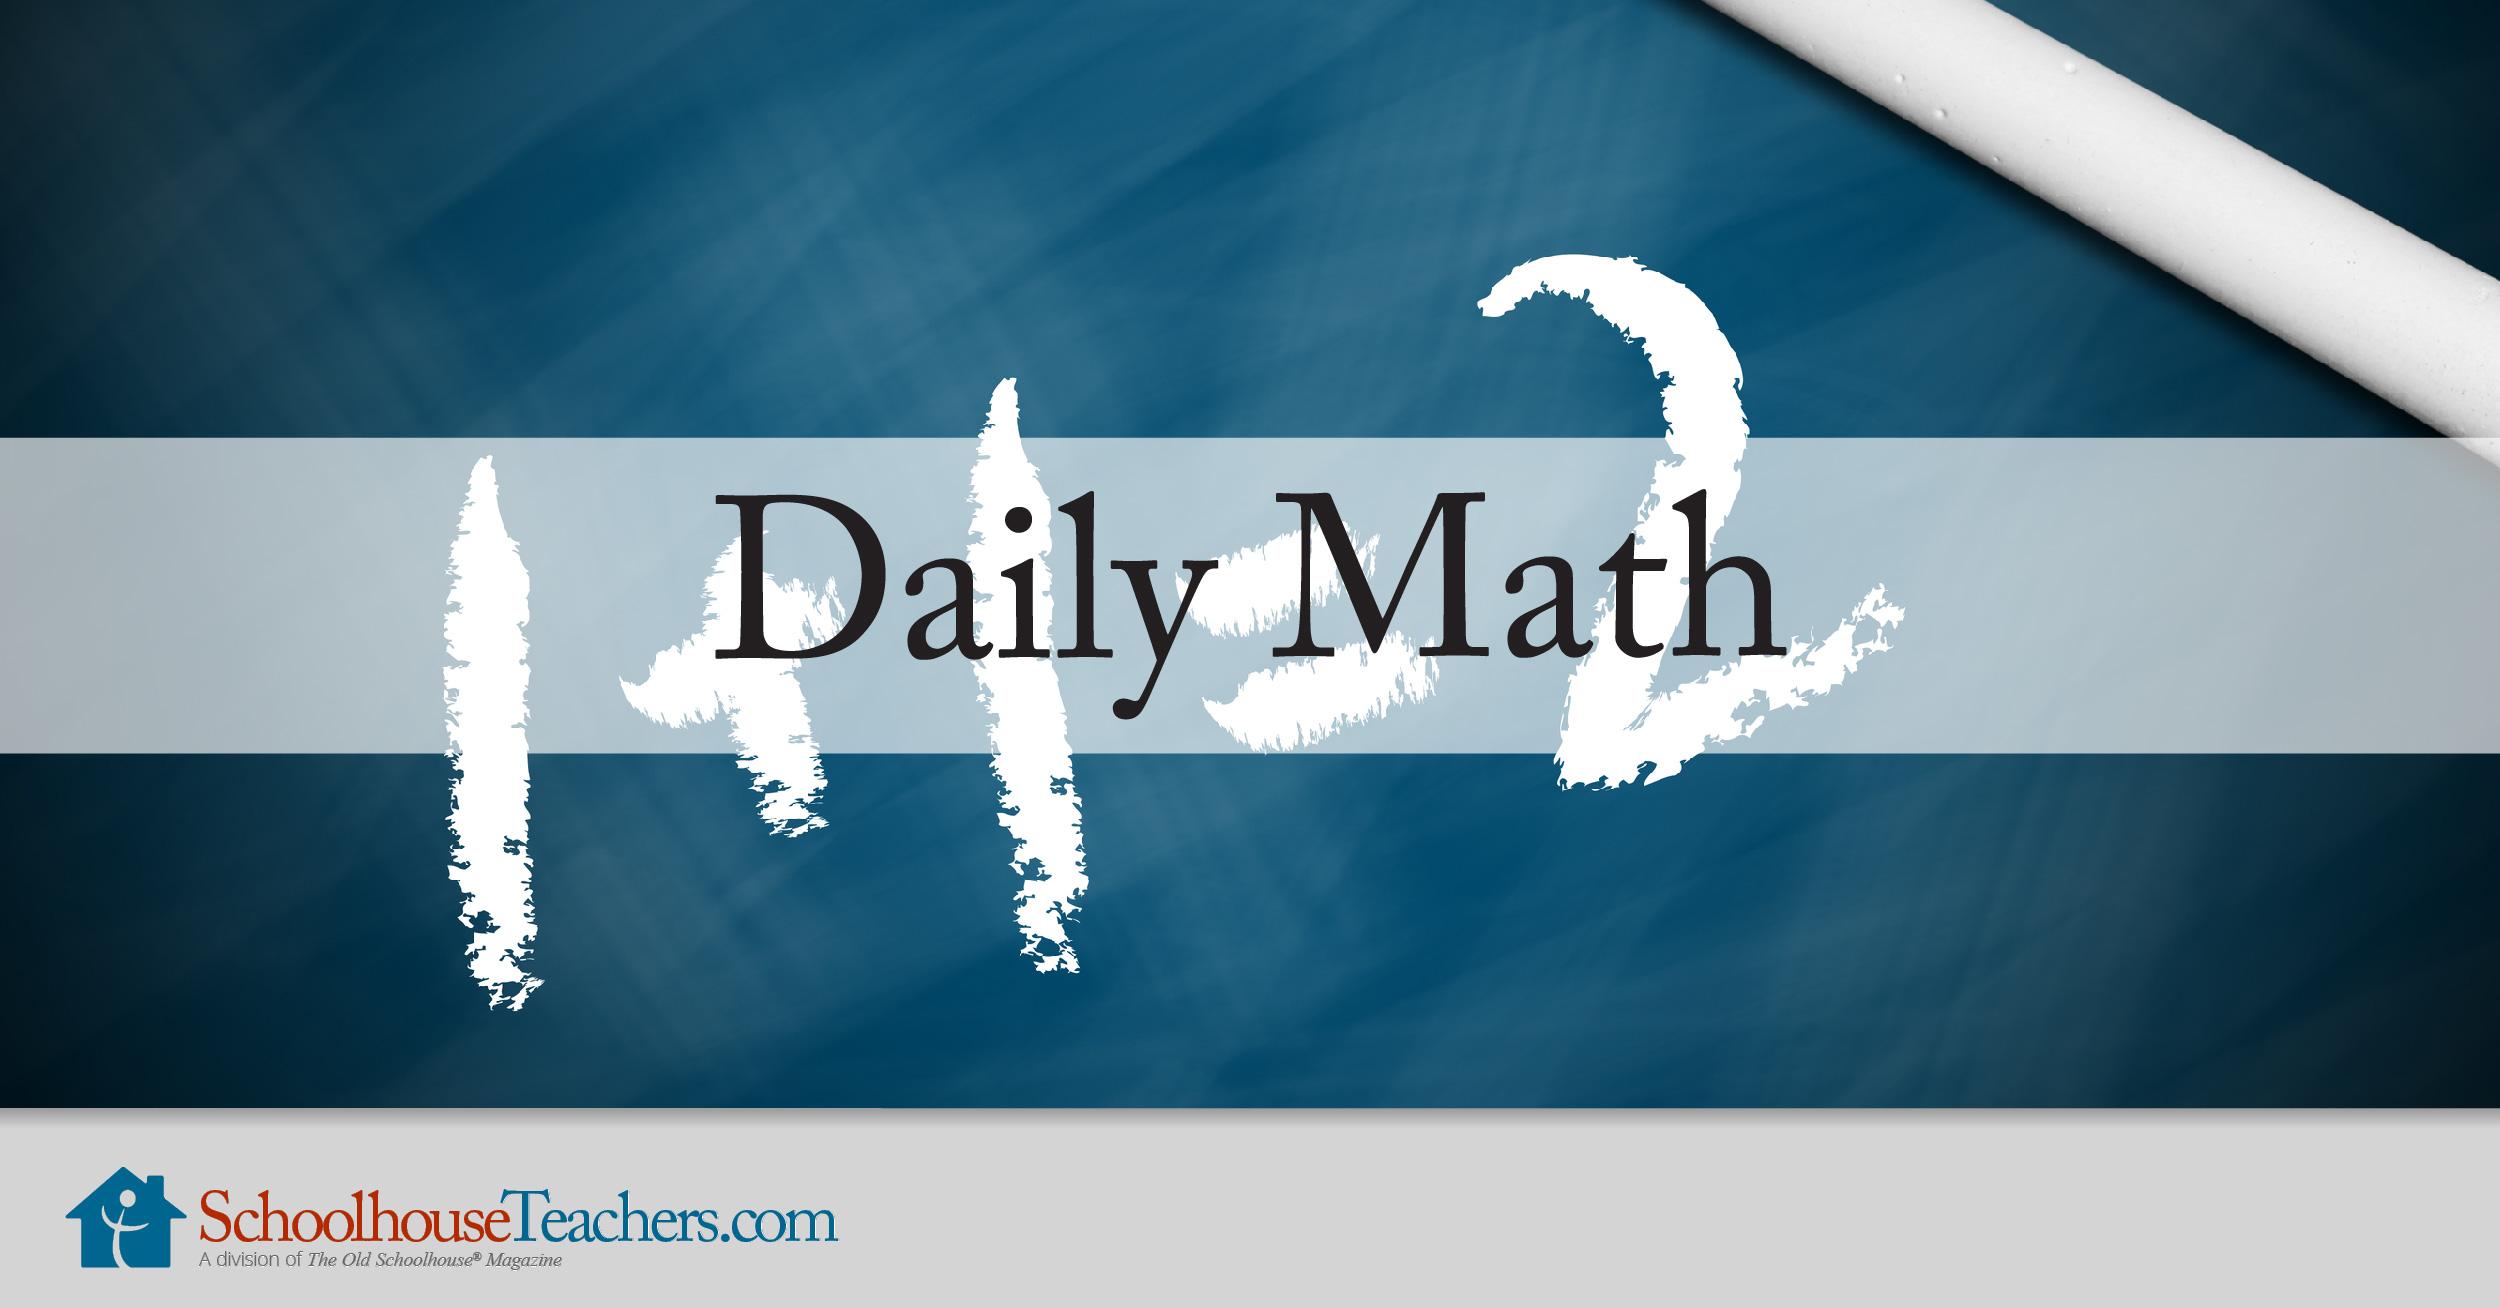 Daily Math Homeschool Course